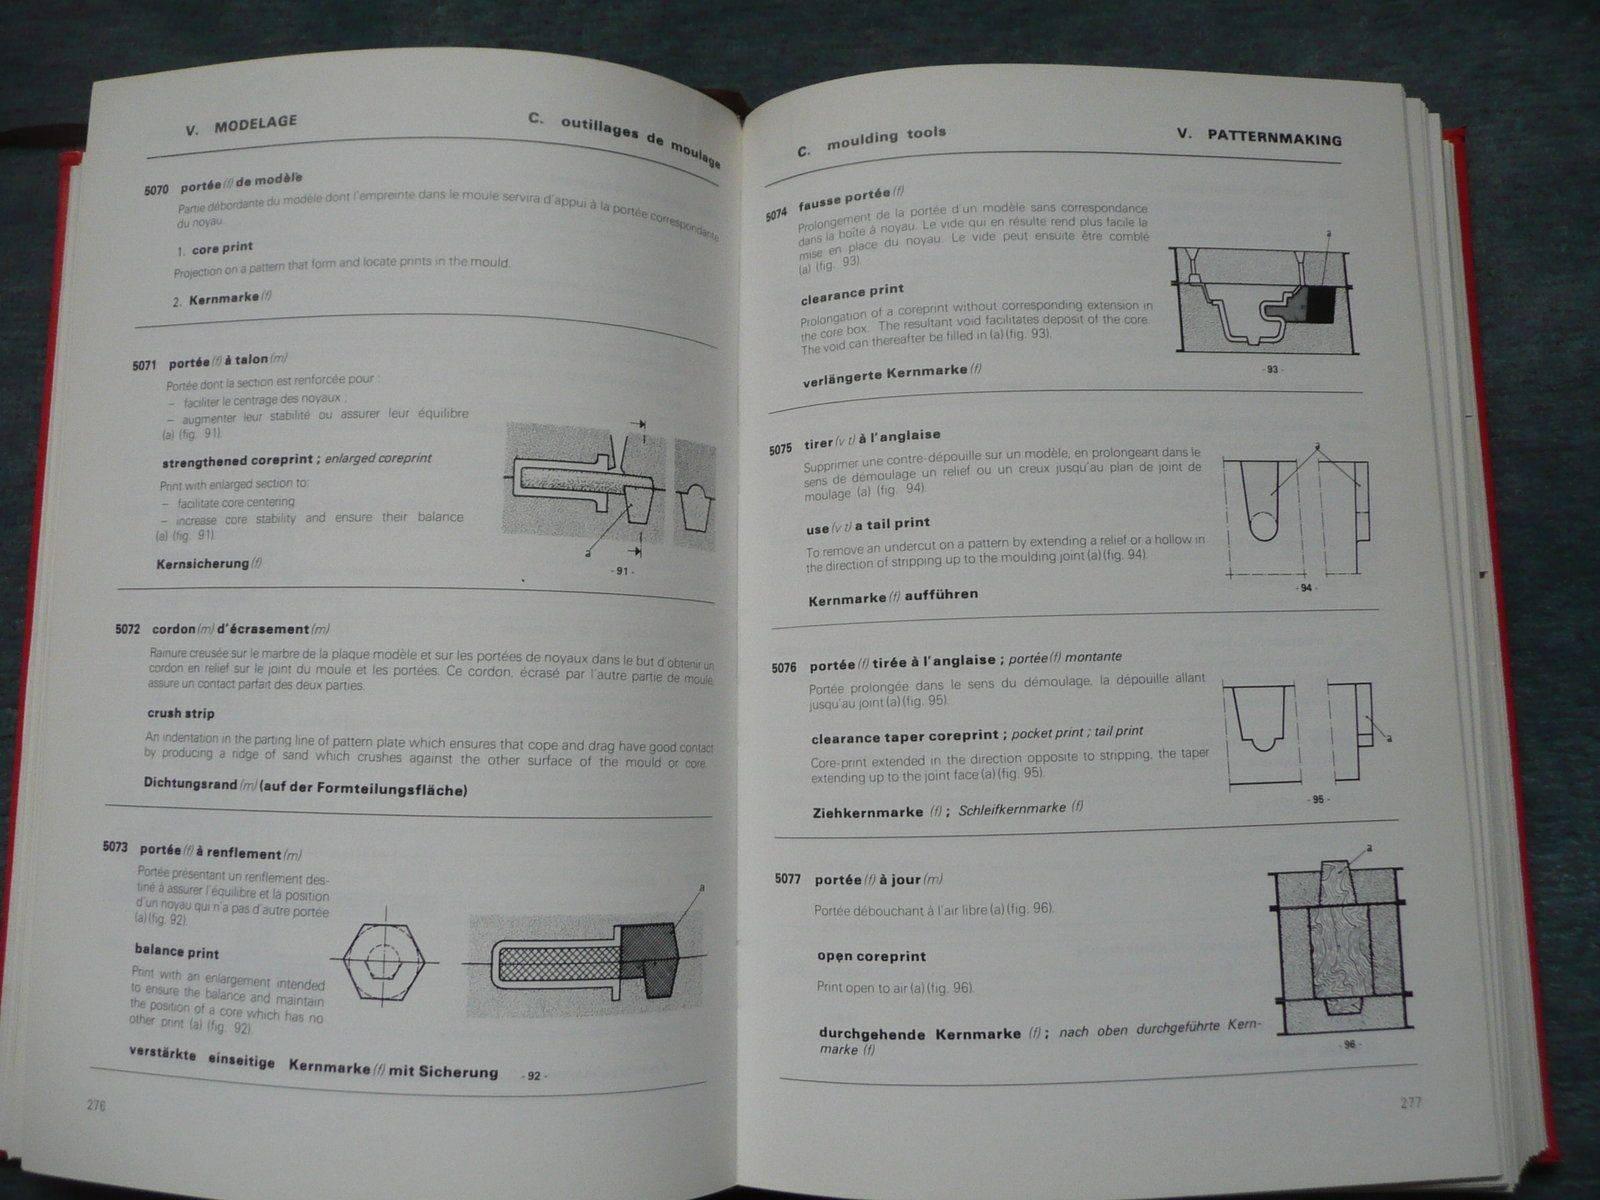 P1110189.JPG